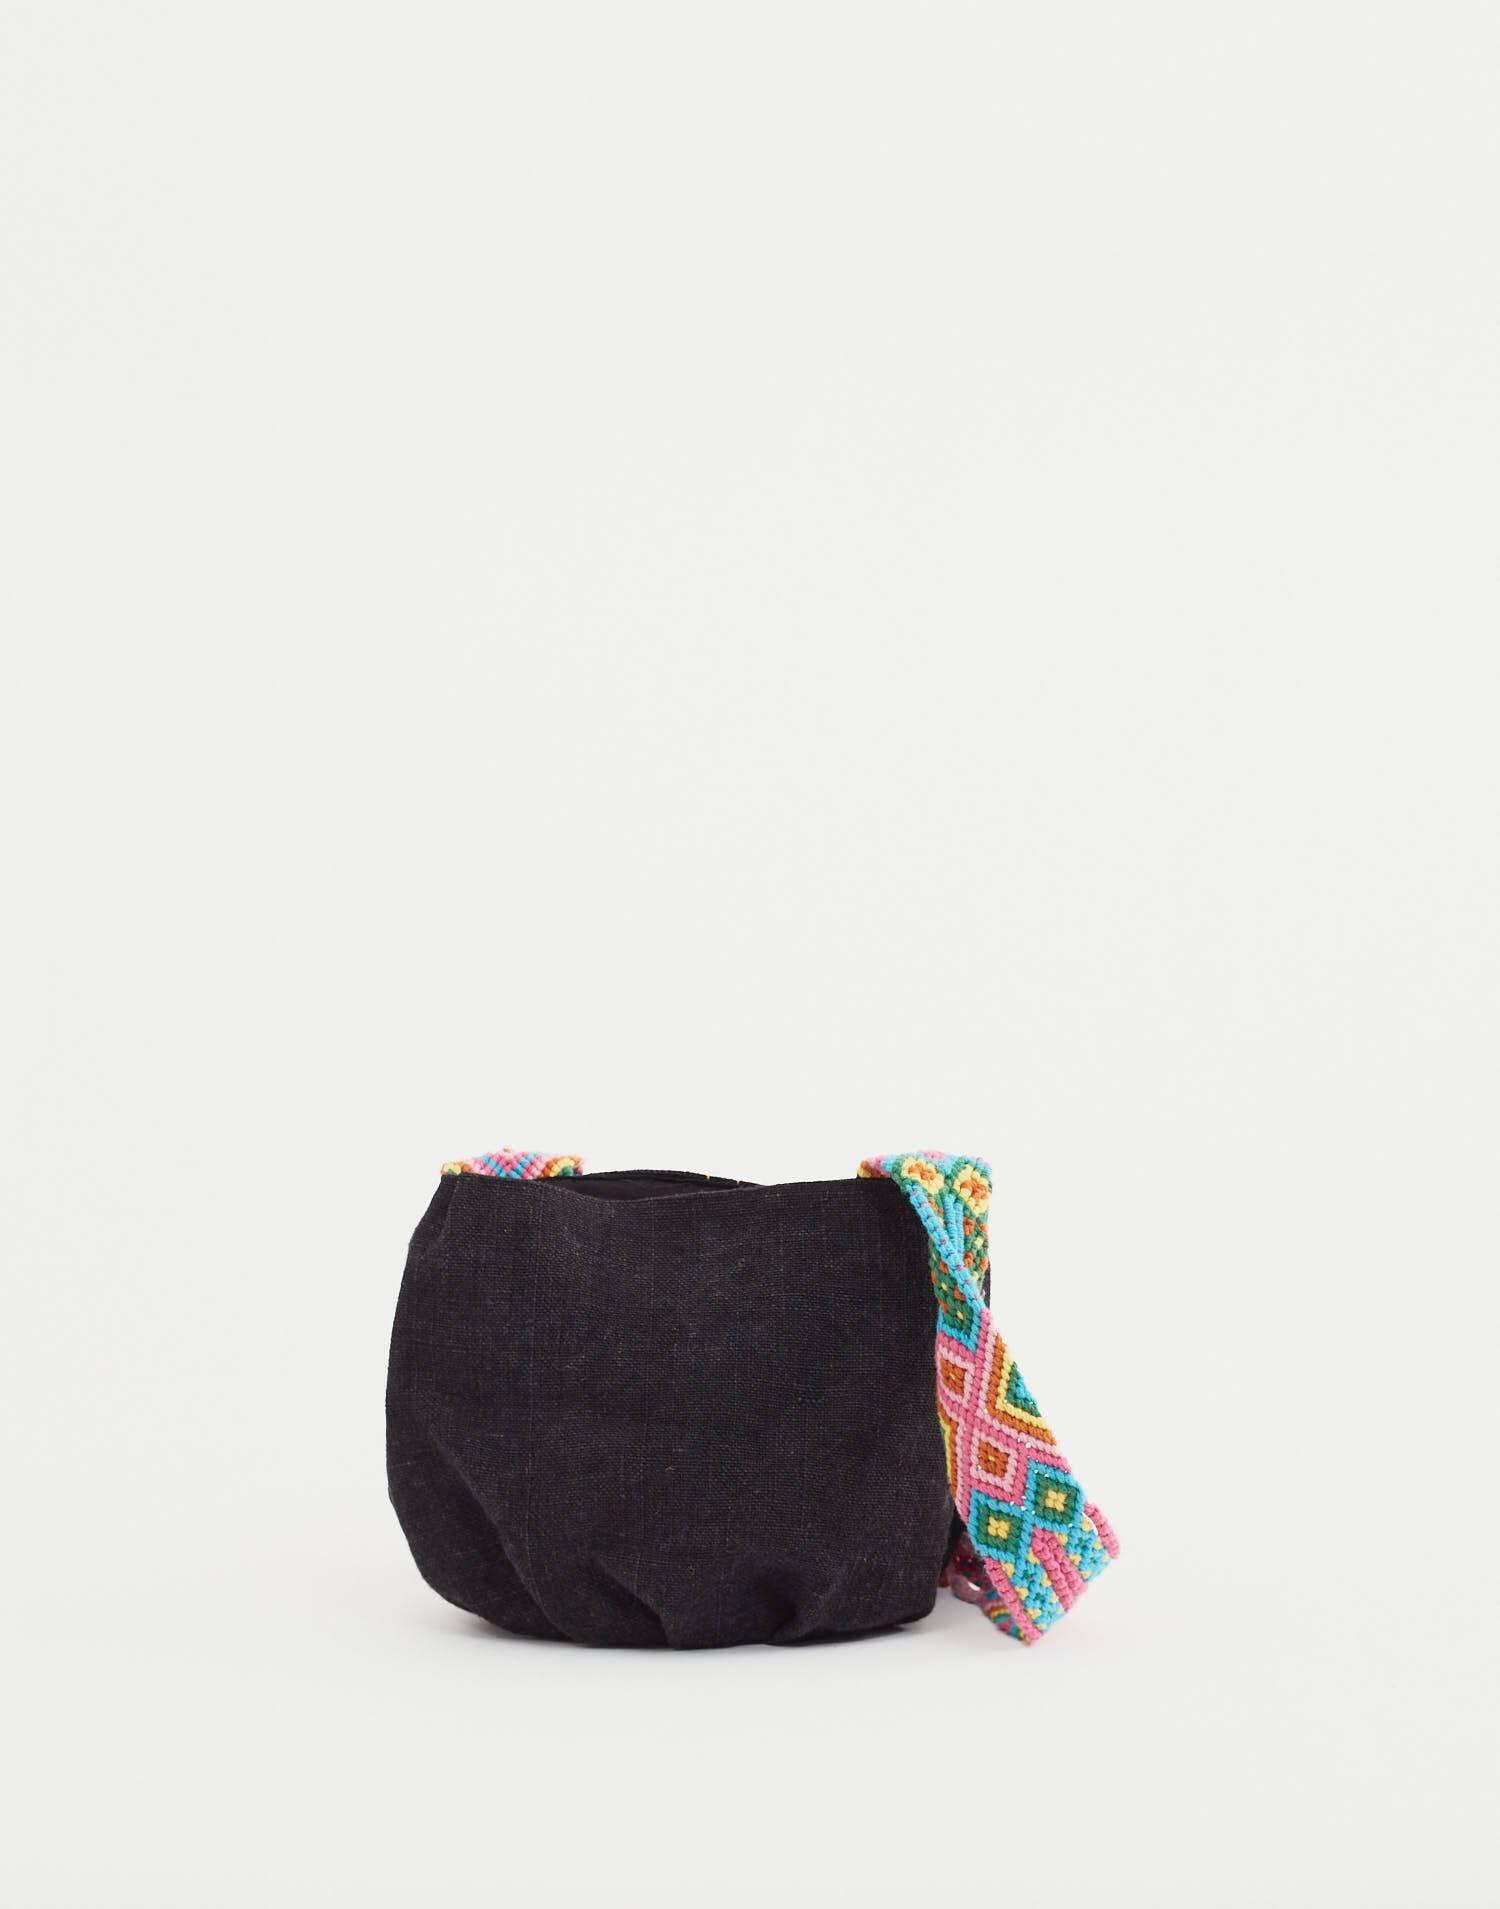 Crossbody woven bag